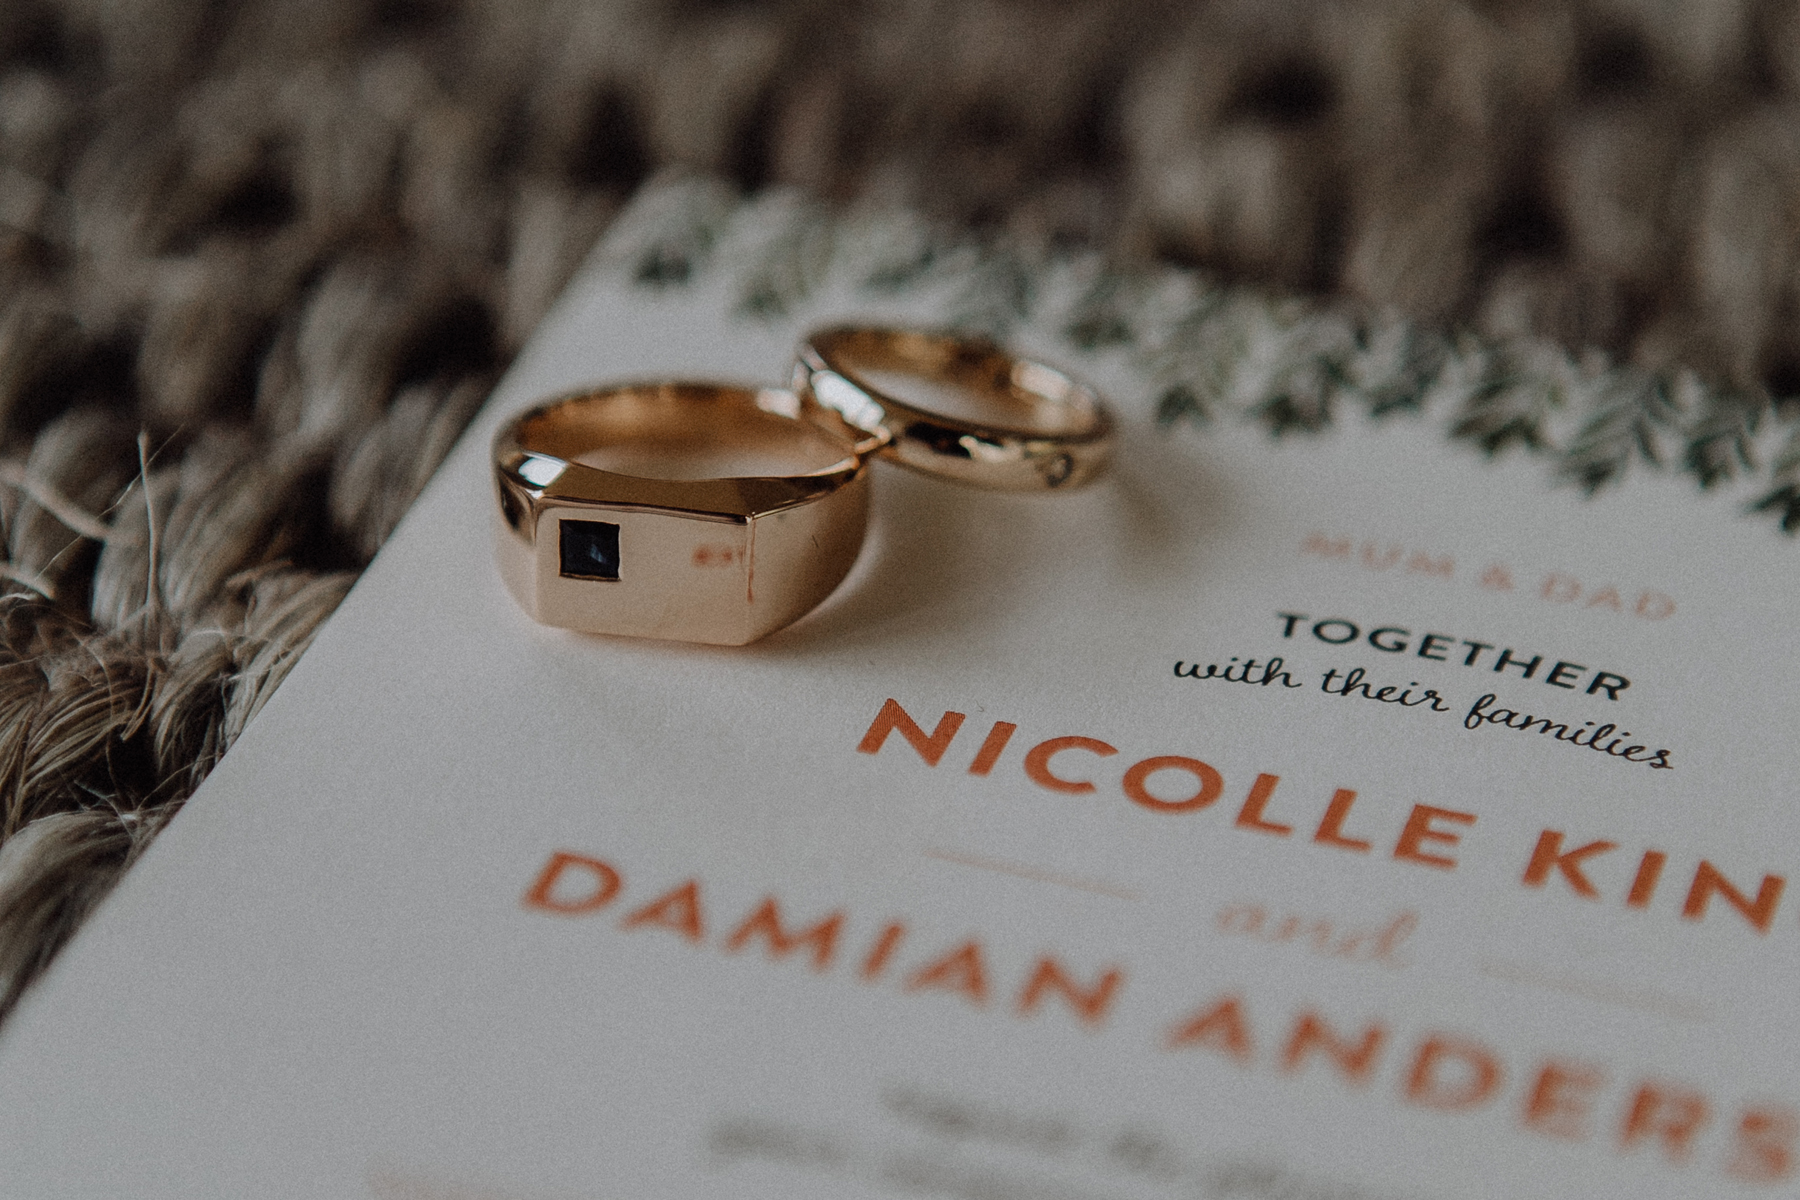 WSP-Nicolle-Damian-28.10.2017-39.jpg